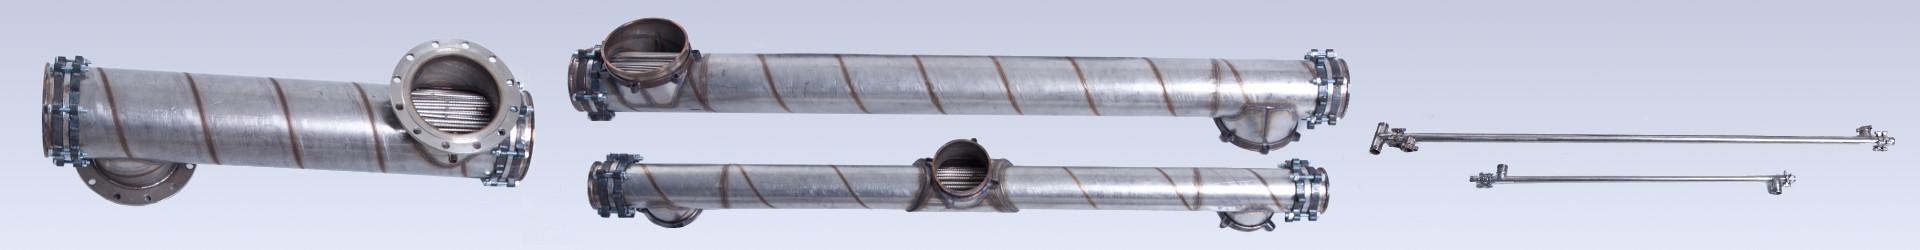 Теплообменник ттаиб Пластинчатый теплообменник ONDA GT025 Комсомольск-на-Амуре